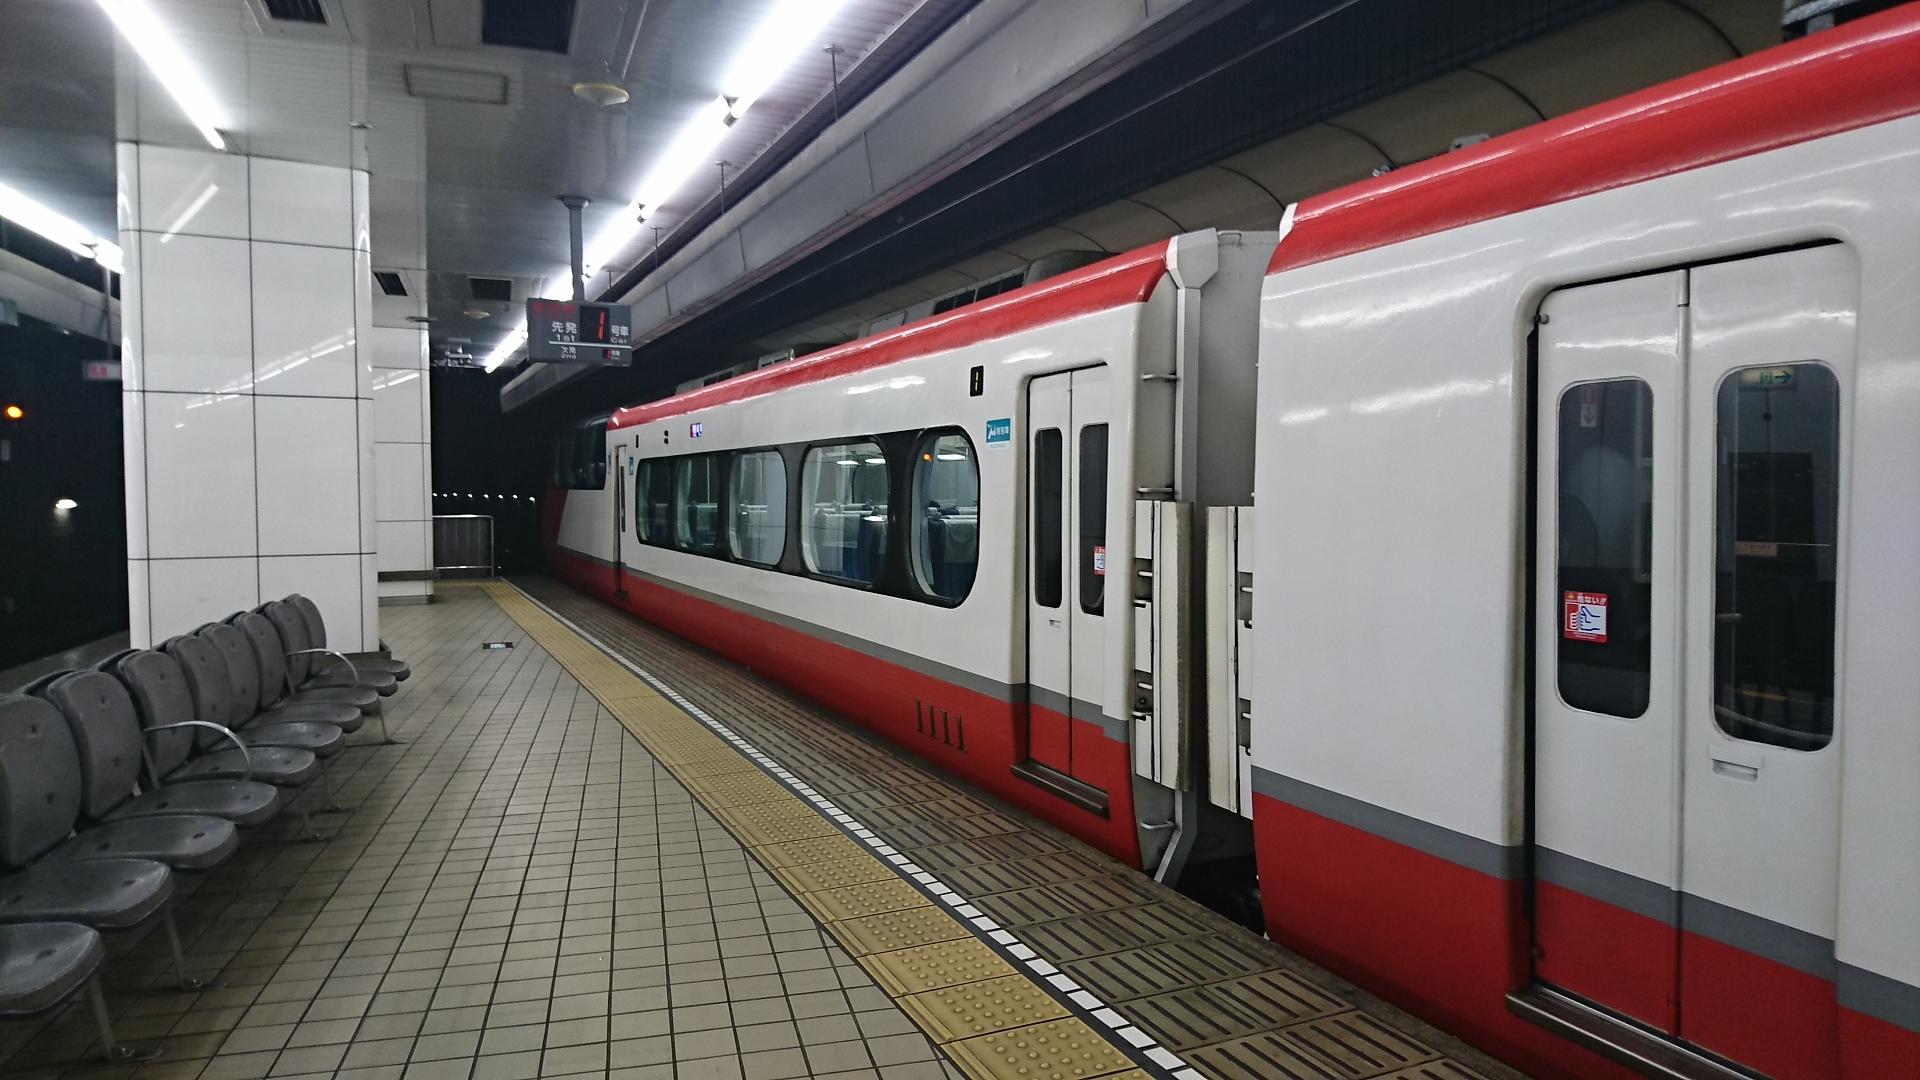 2018.1.8 名古屋 (9)名古屋 - 岐阜いき特急 1920-1080